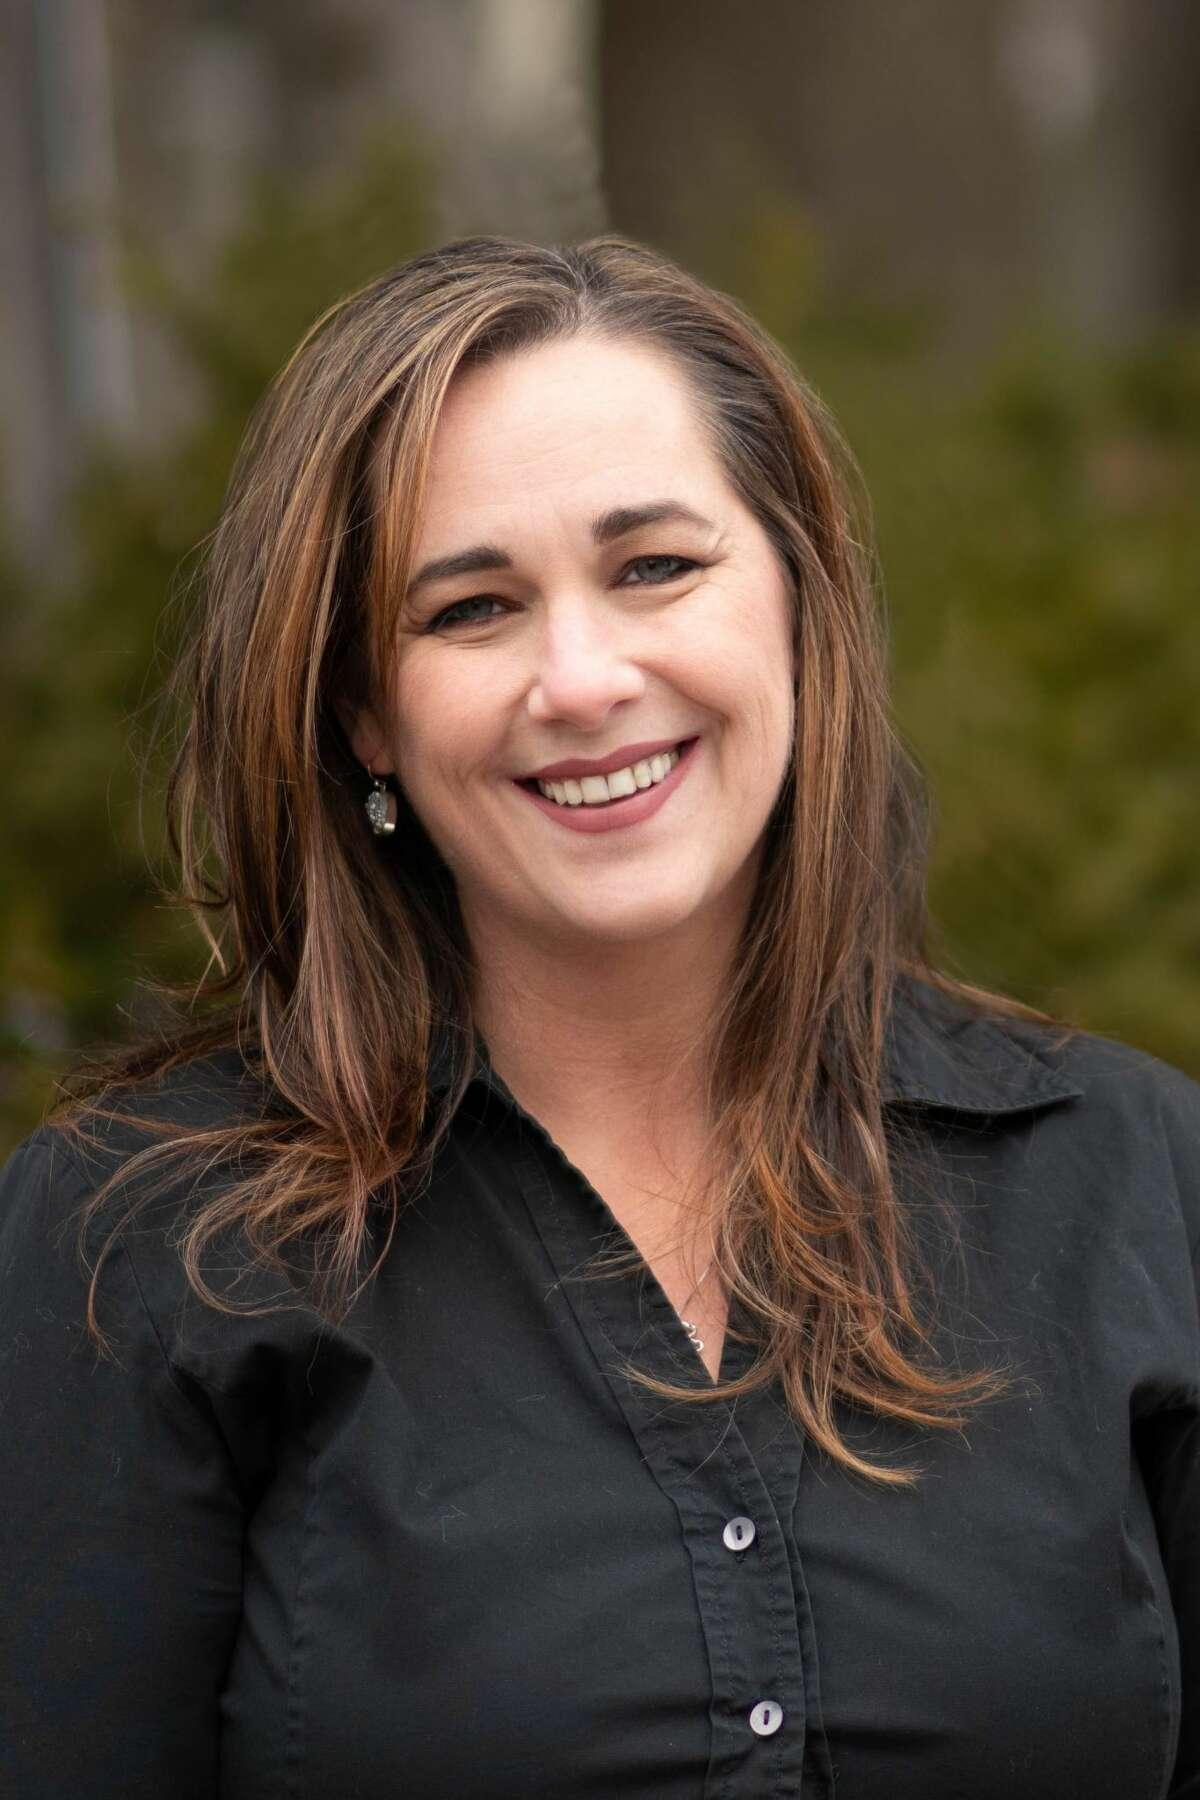 Democrat Melissa Boxer is challenging Republican Clifton Park Supervisor Phil Barrett in the November election.